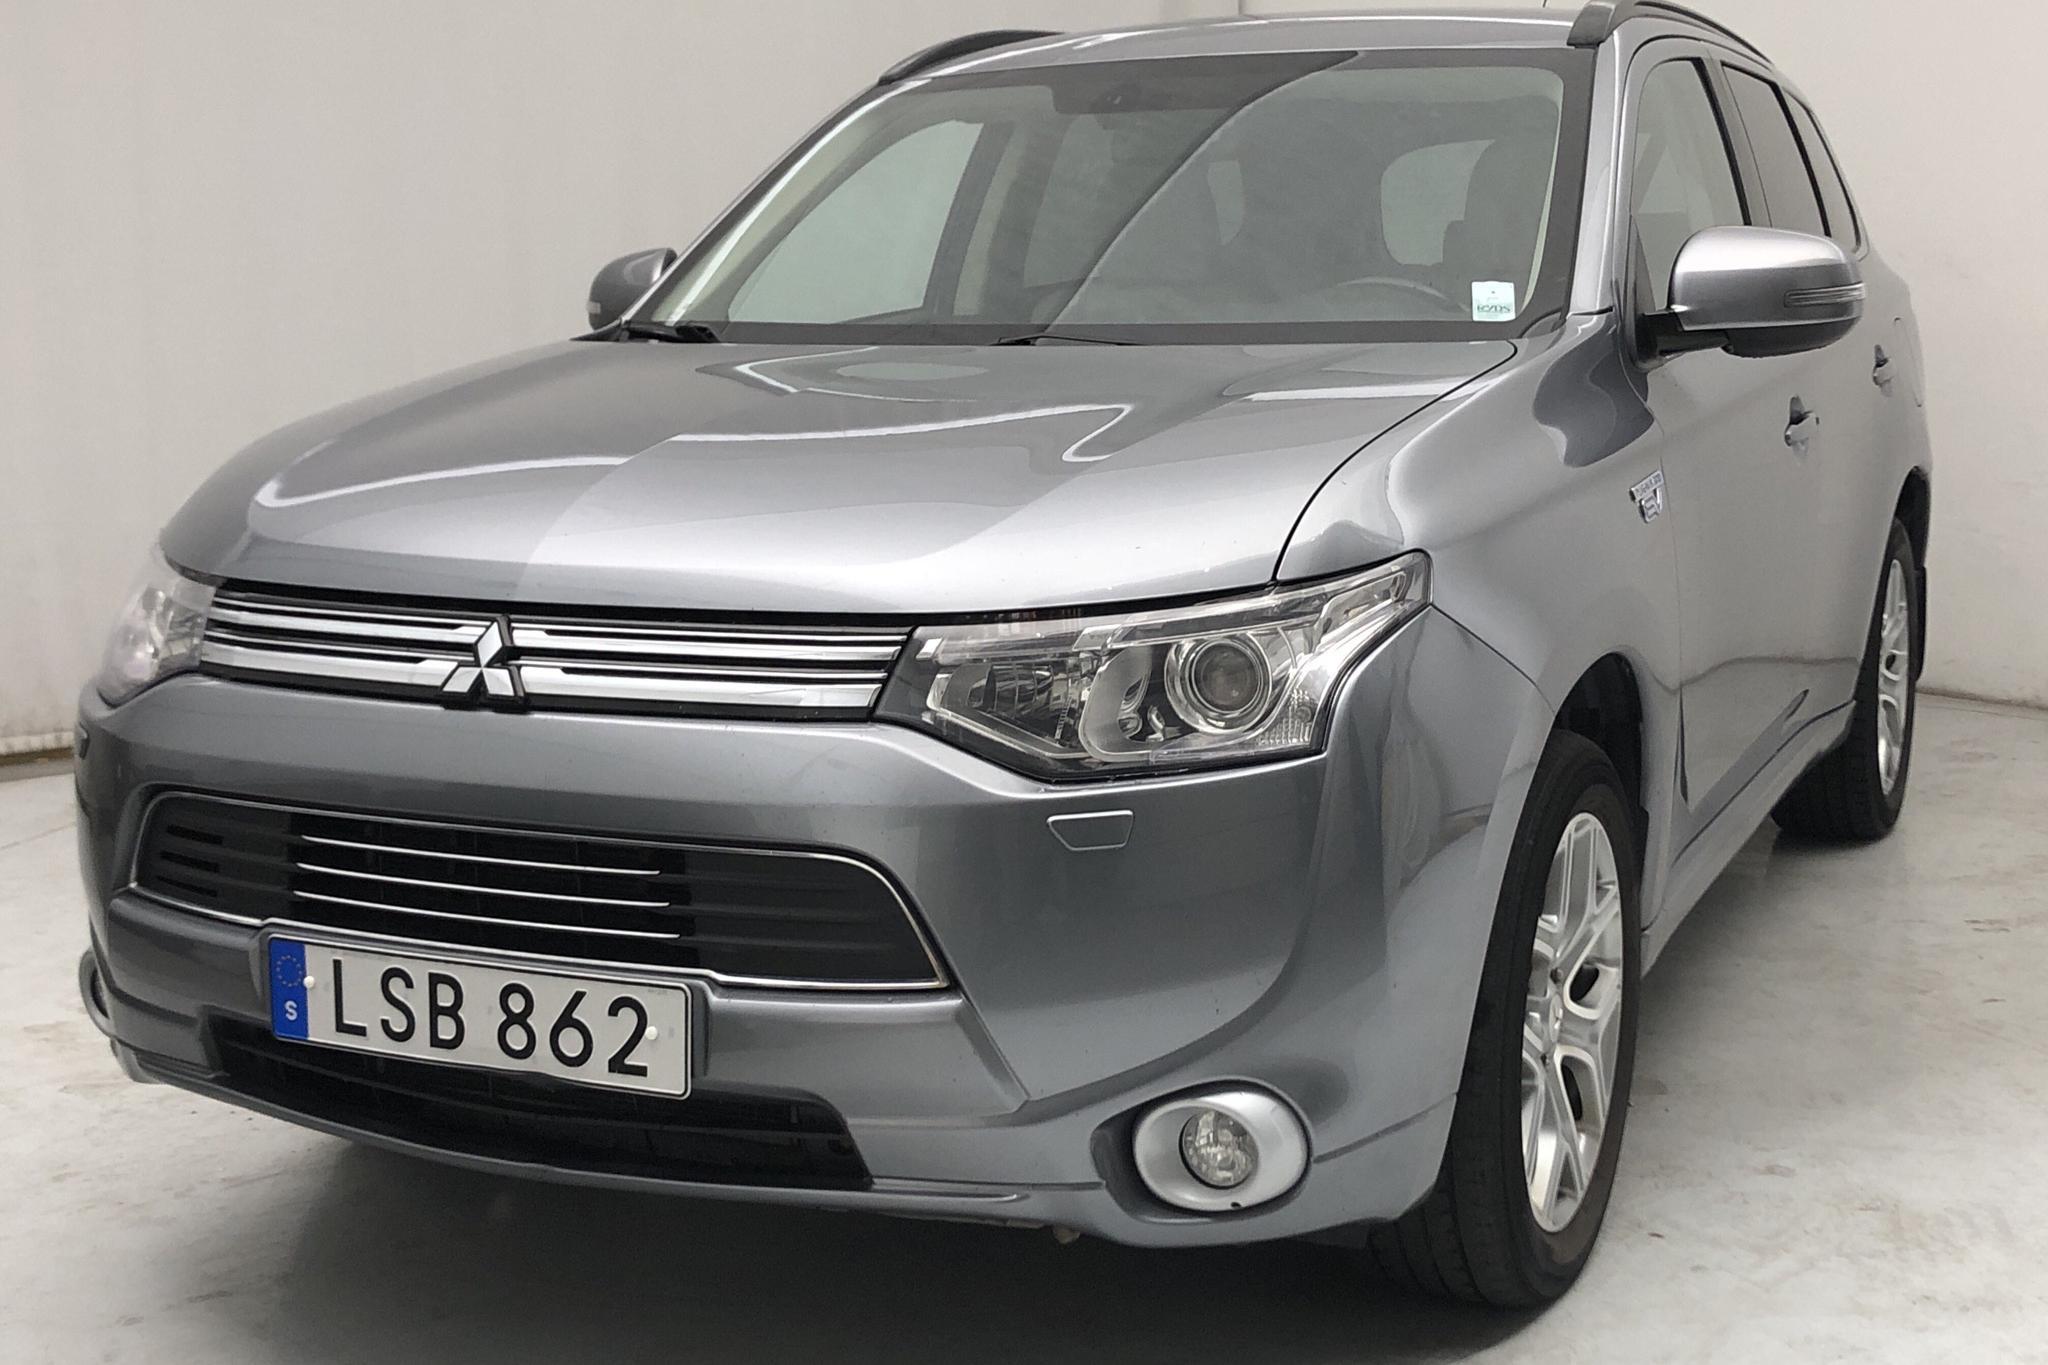 Mitsubishi Outlander 2.0 Plug-in Hybrid 4WD (121hk) - 16 646 mil - Automat - 2014